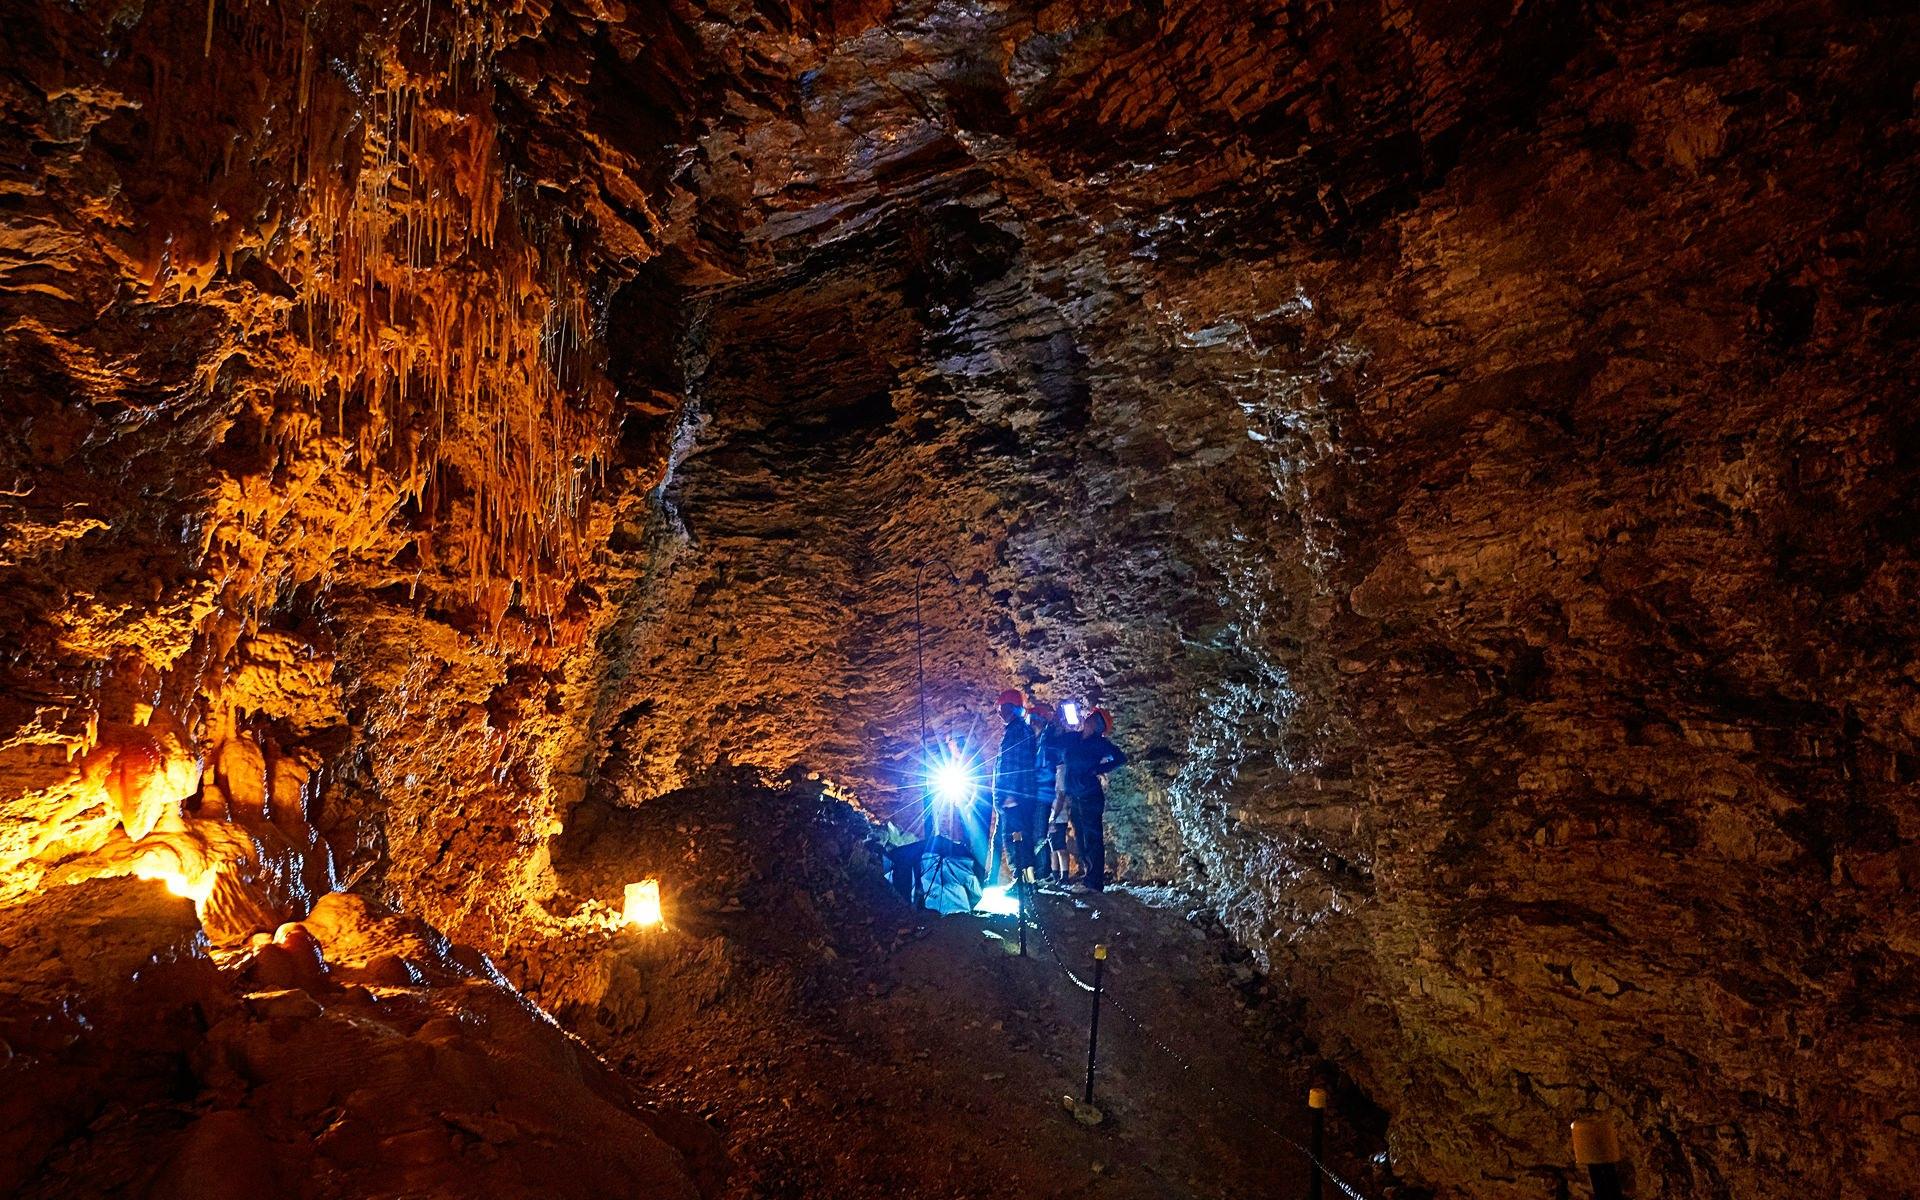 caves-kaikoura-cave-tour-02